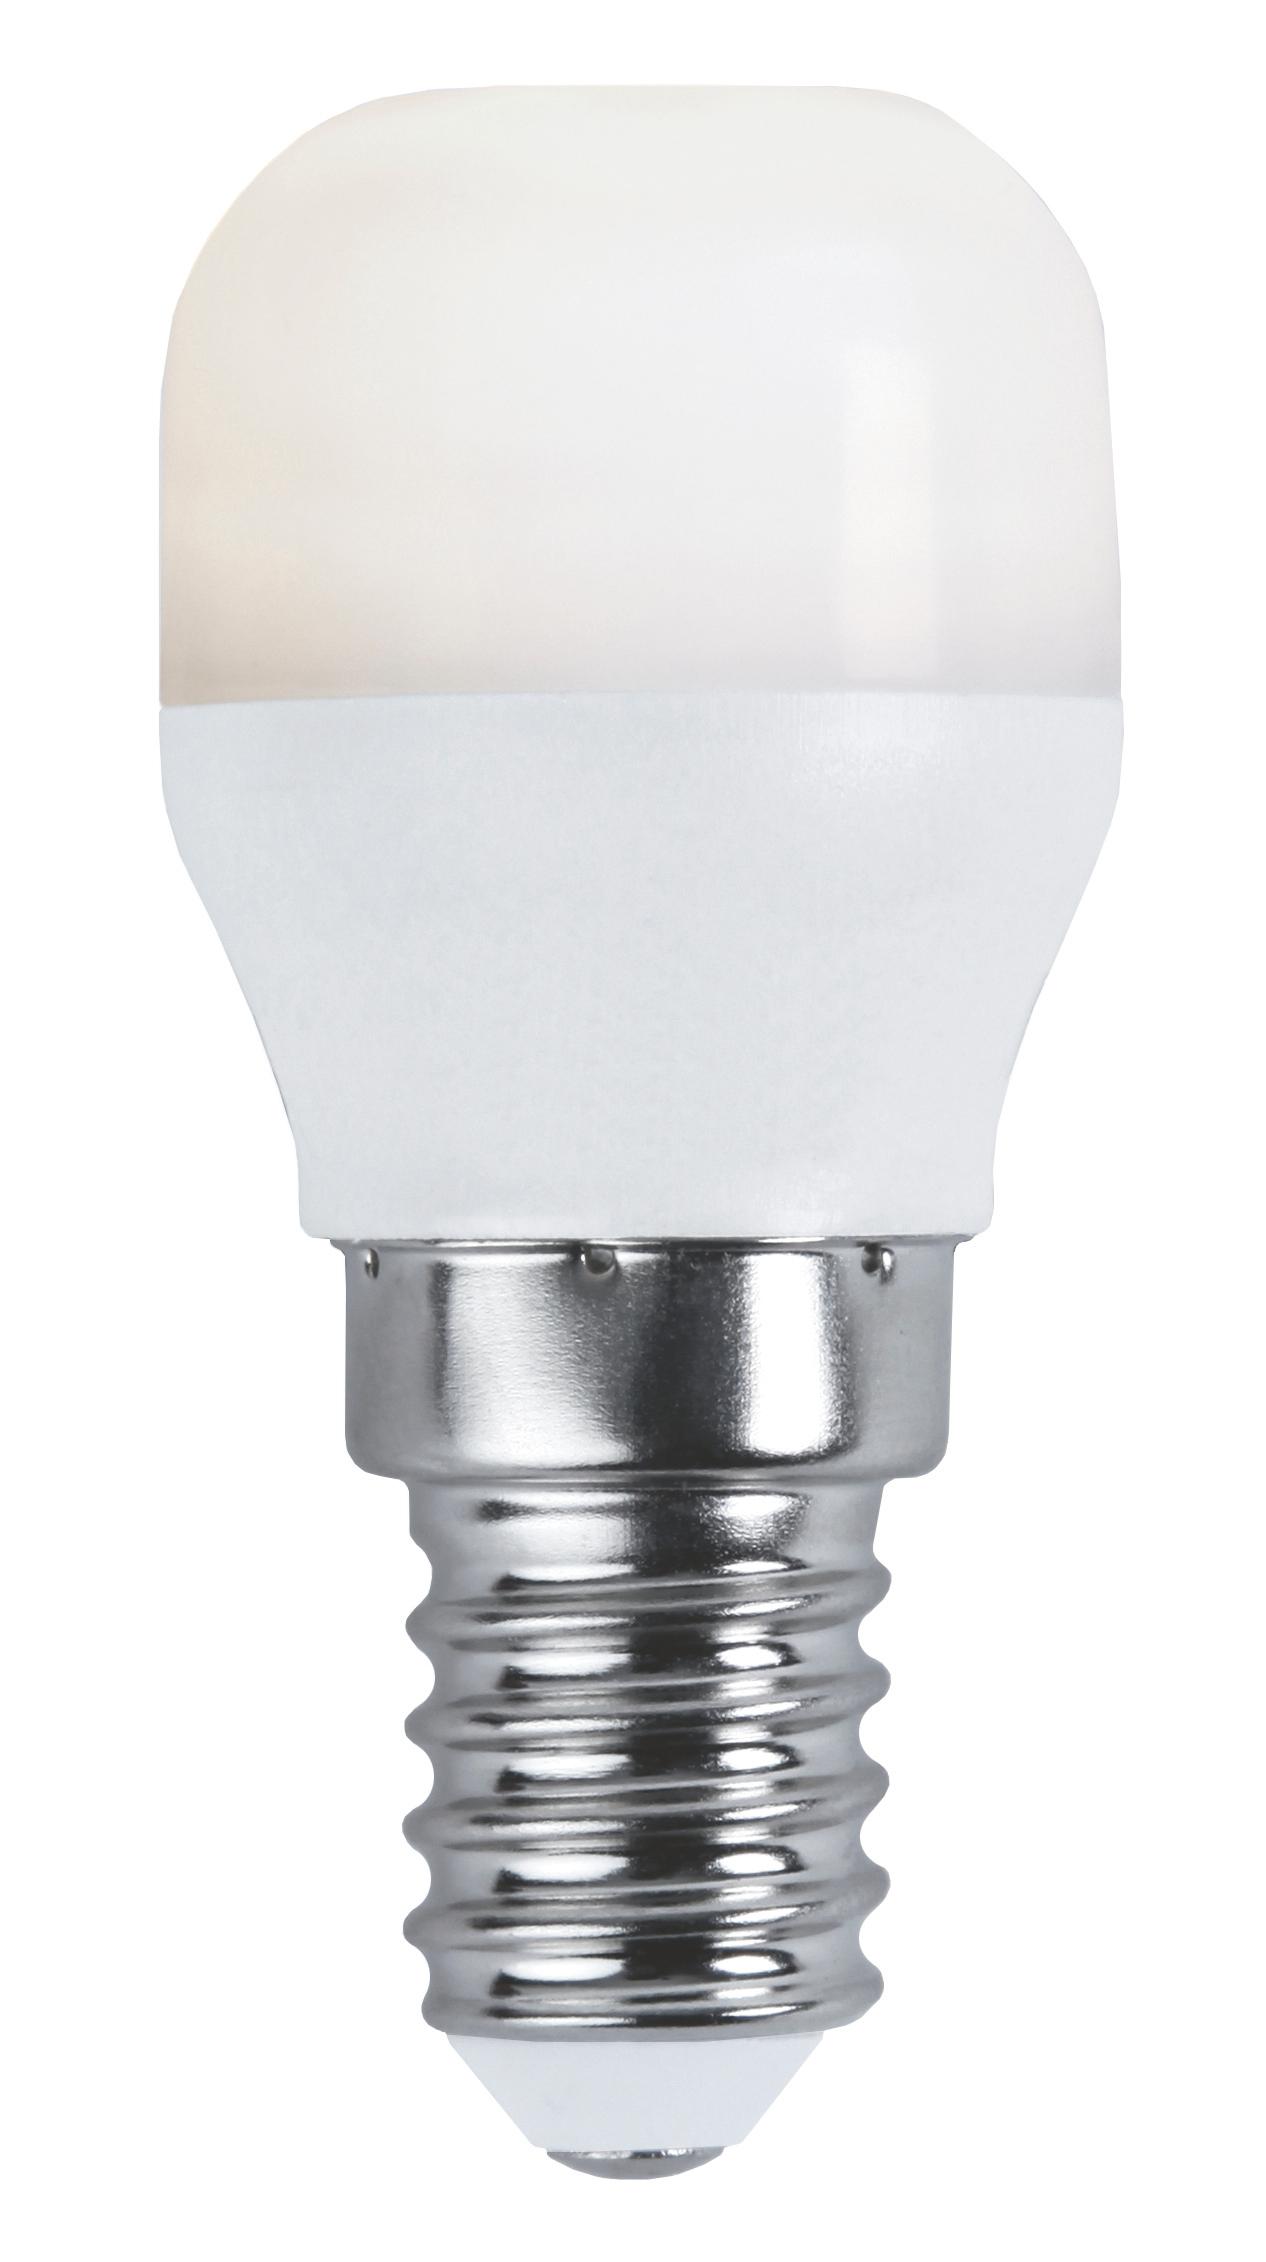 Elpære Promo LED Opal E14 Star Trading Lyskilder til Boligen i Hvid